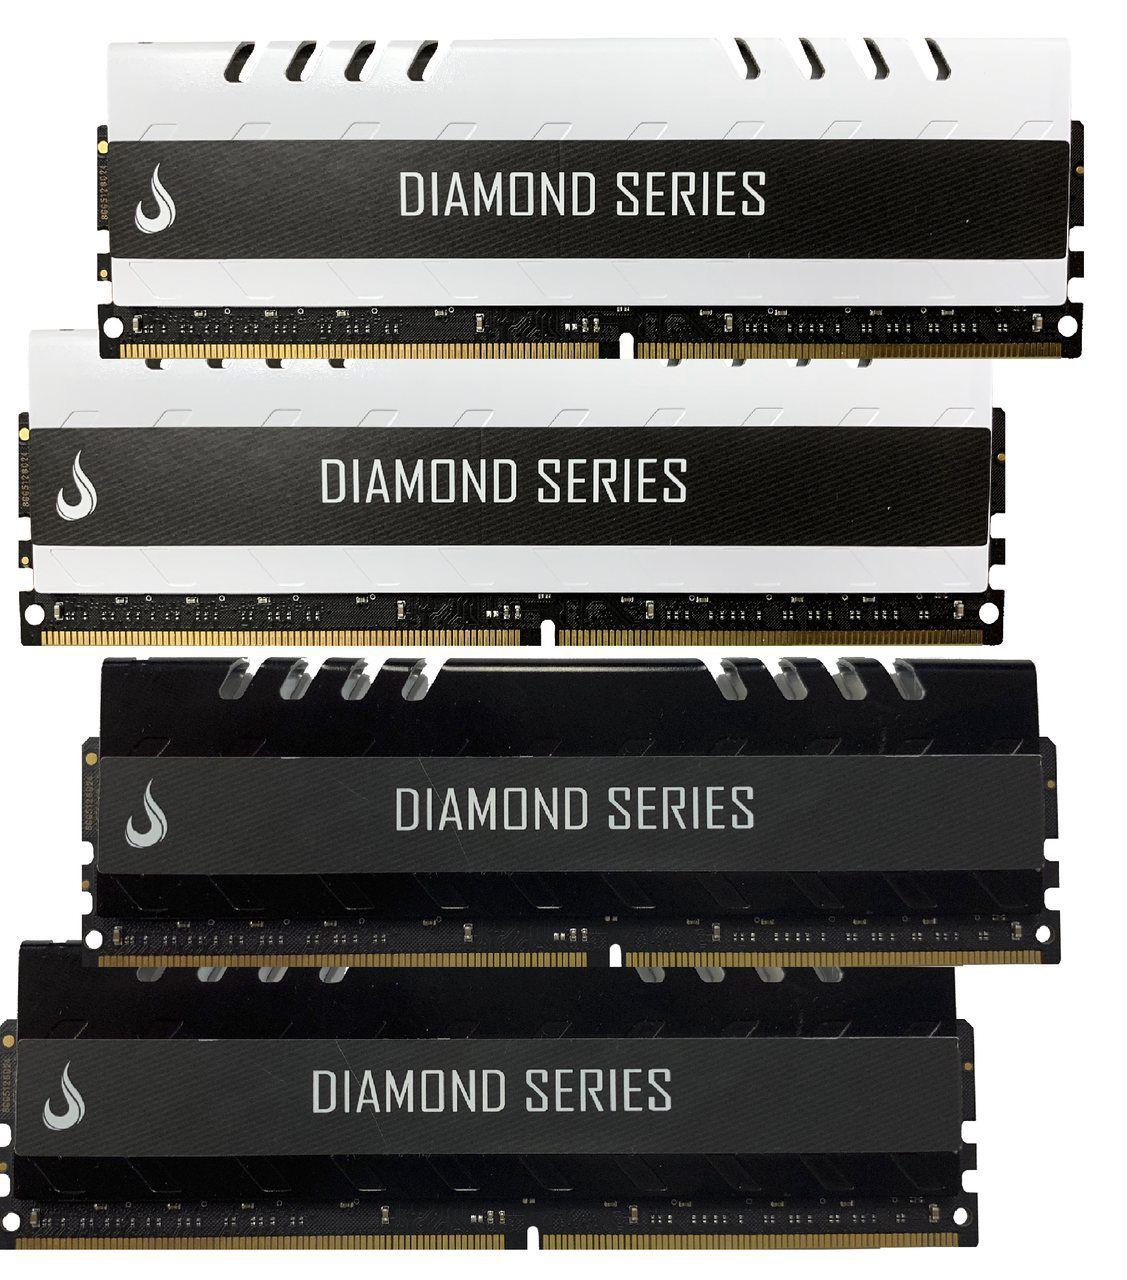 Combo 4x Memoria Ram DDR4 8GB 3000MHZ Diamond - Preta /  Branca  - Loja Rise Mode